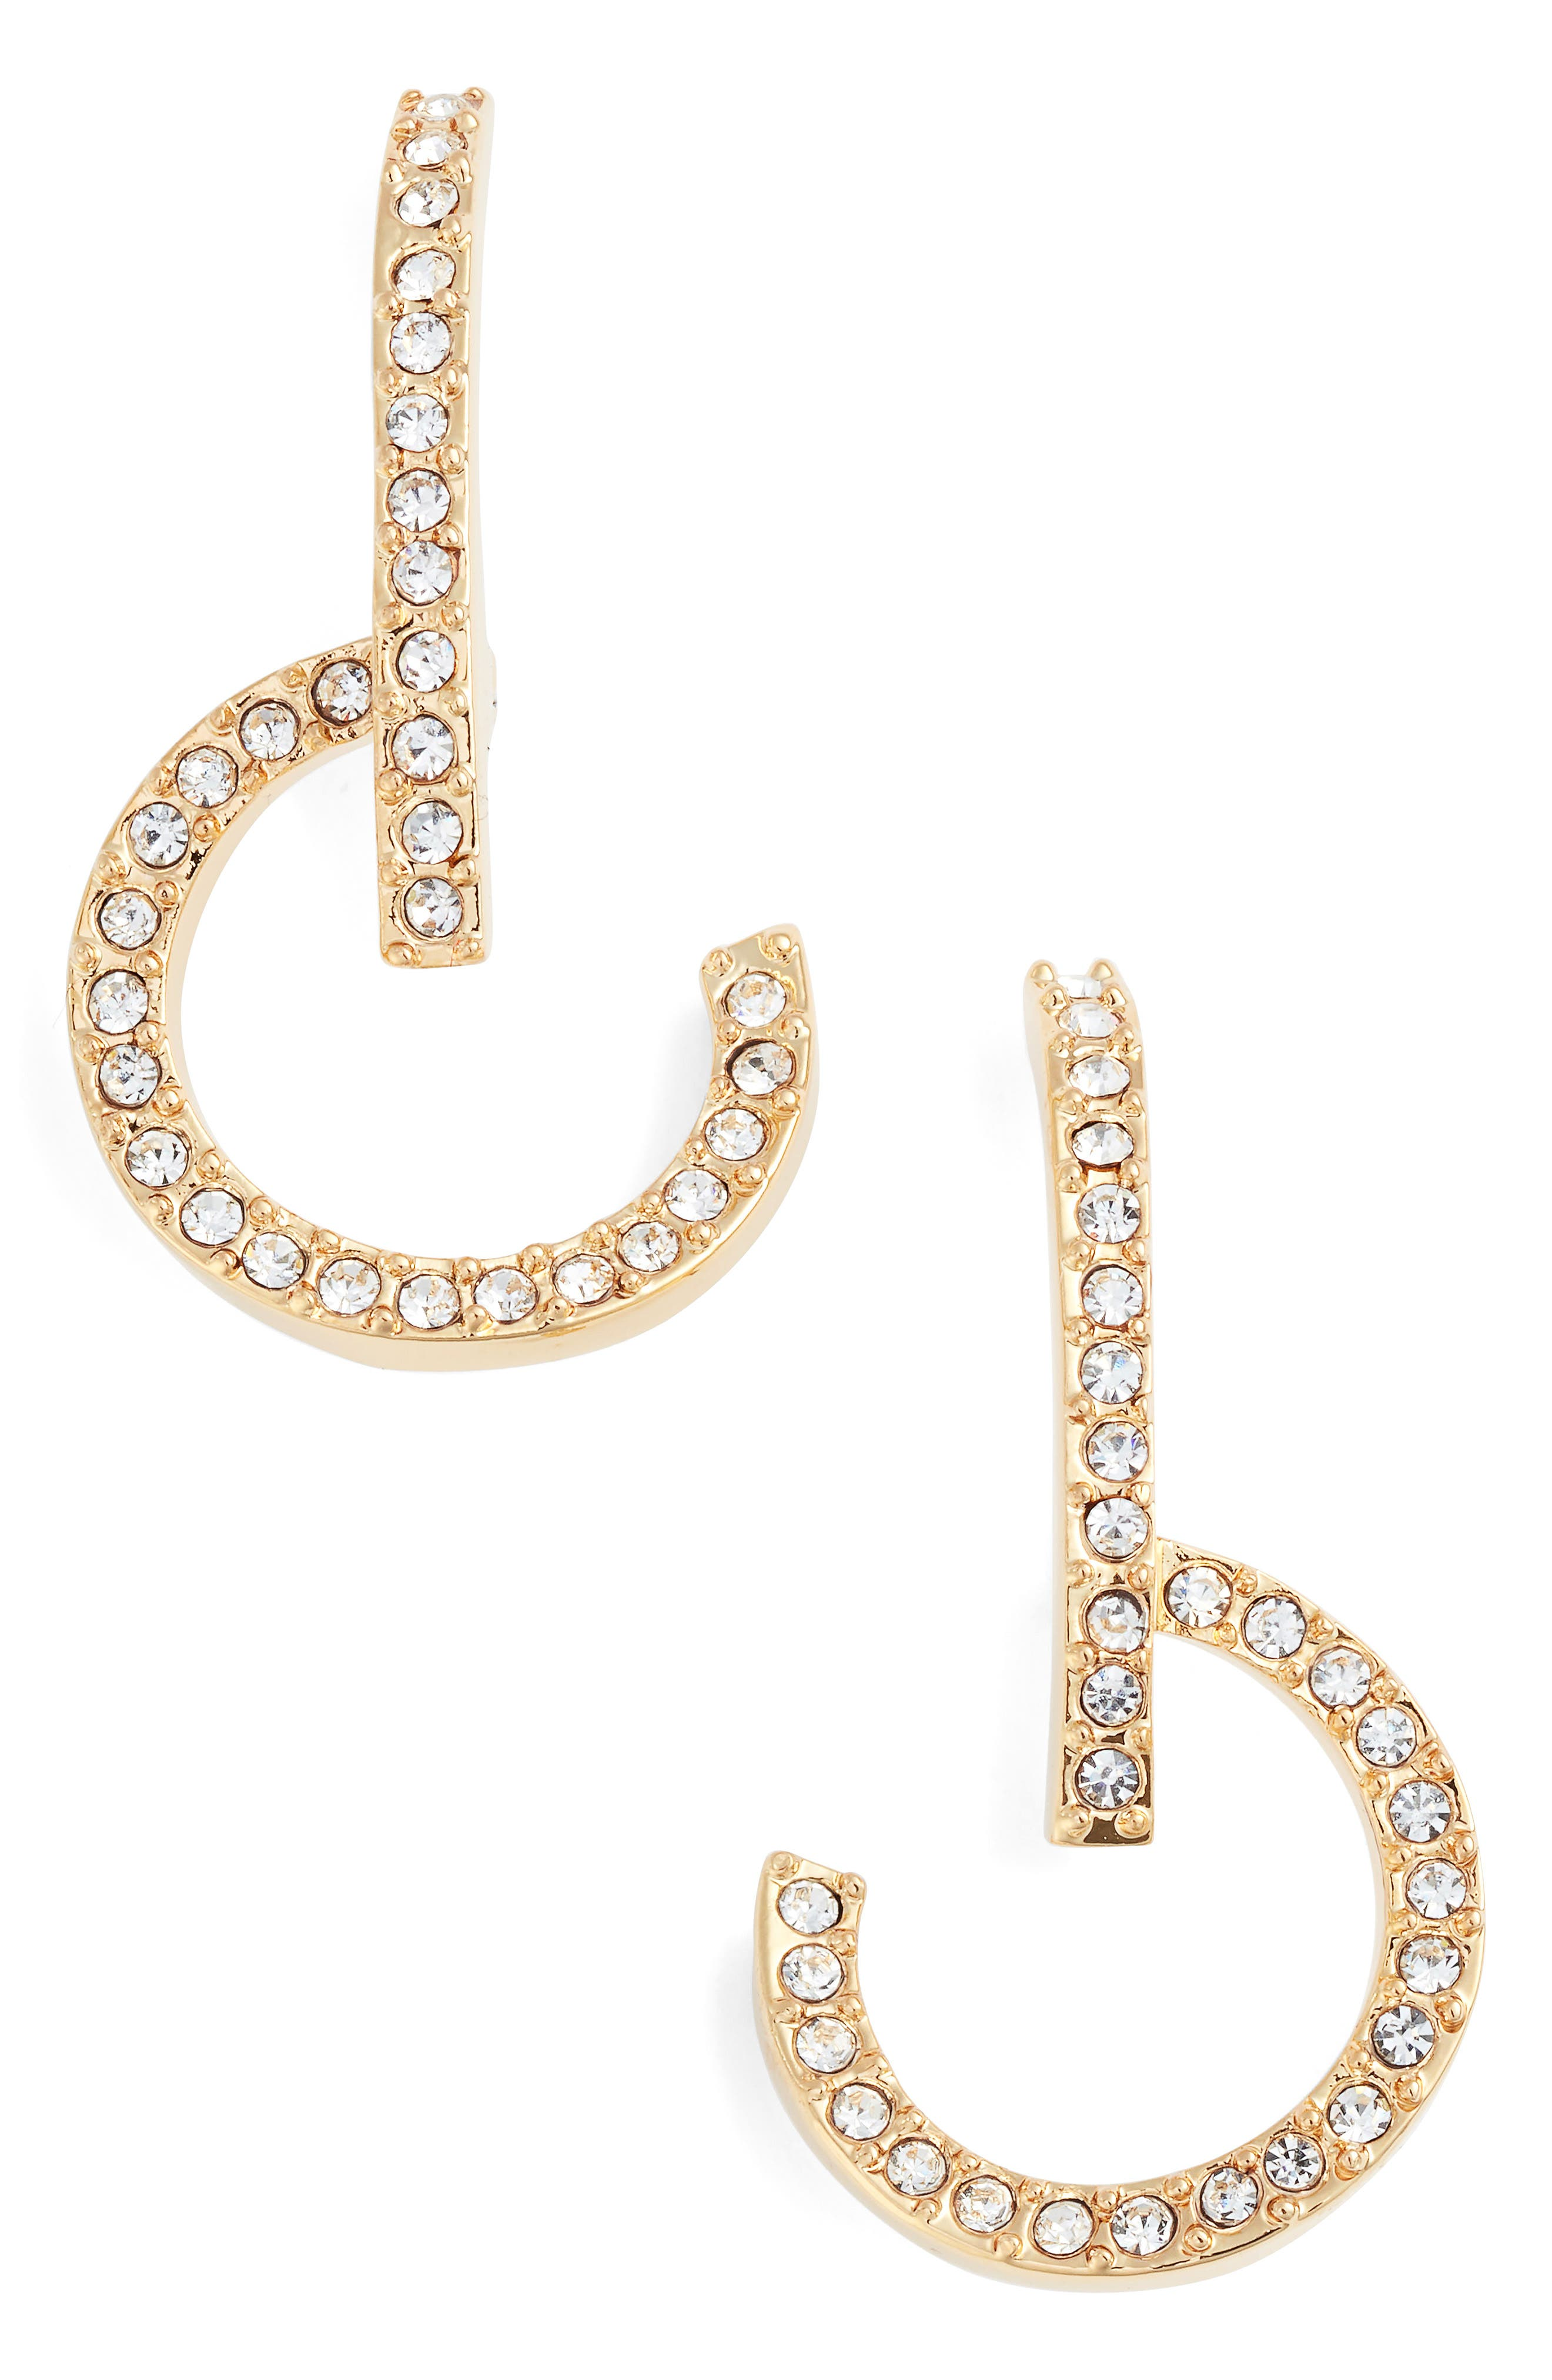 Lobe and Hoop Earrings,                             Main thumbnail 1, color,                             Gold